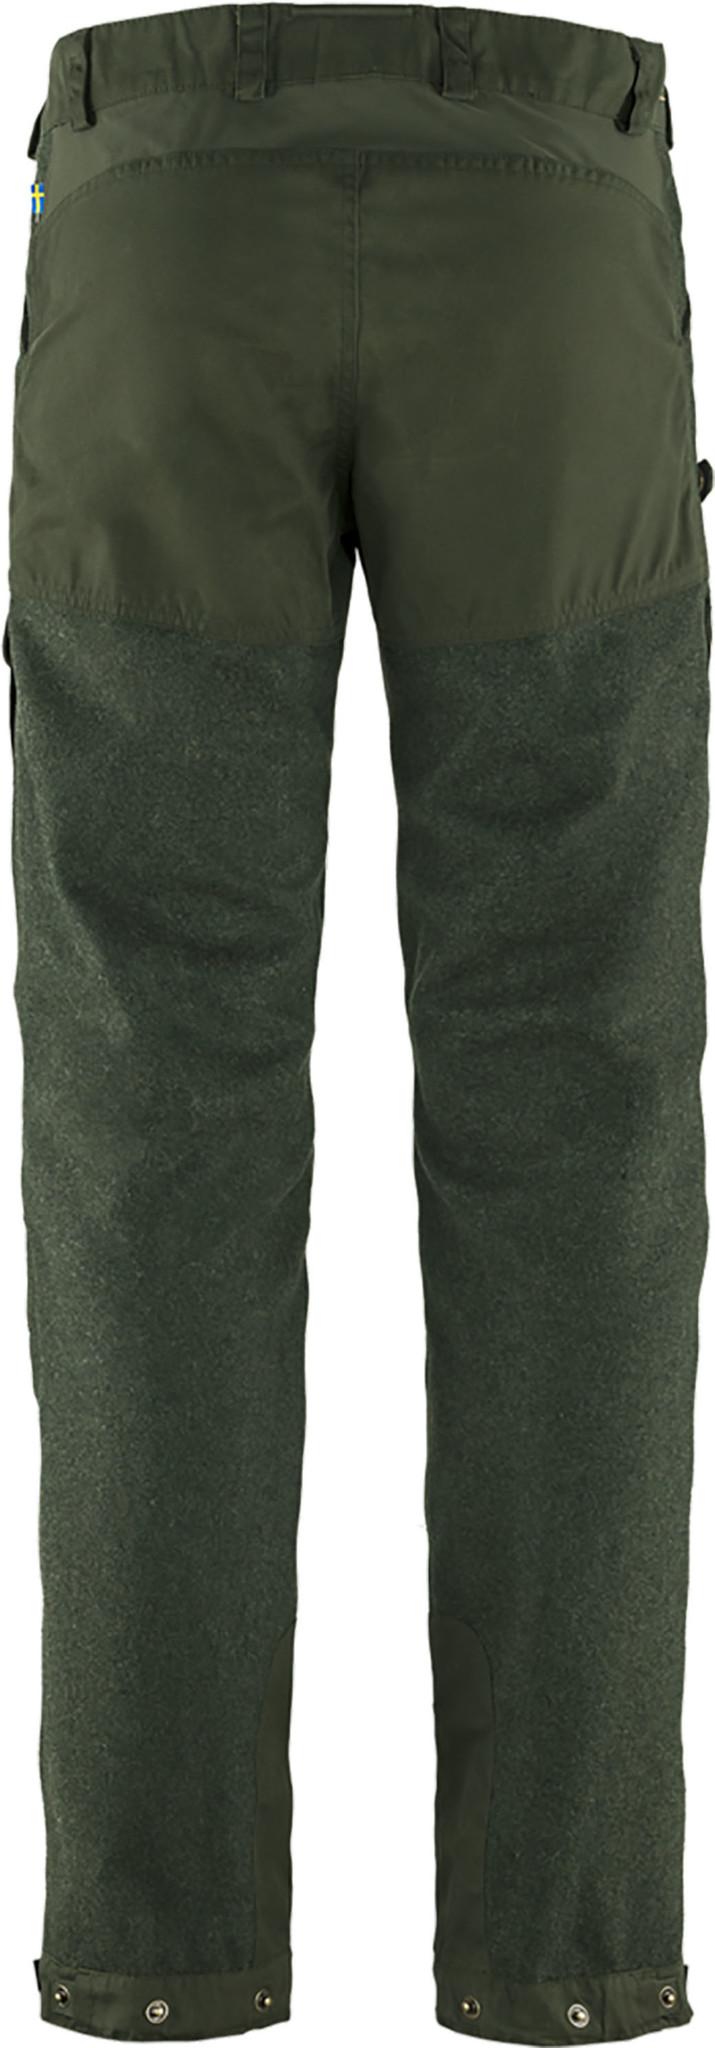 Fjällräven Värmland Wool Trousers M Deep Forest-2